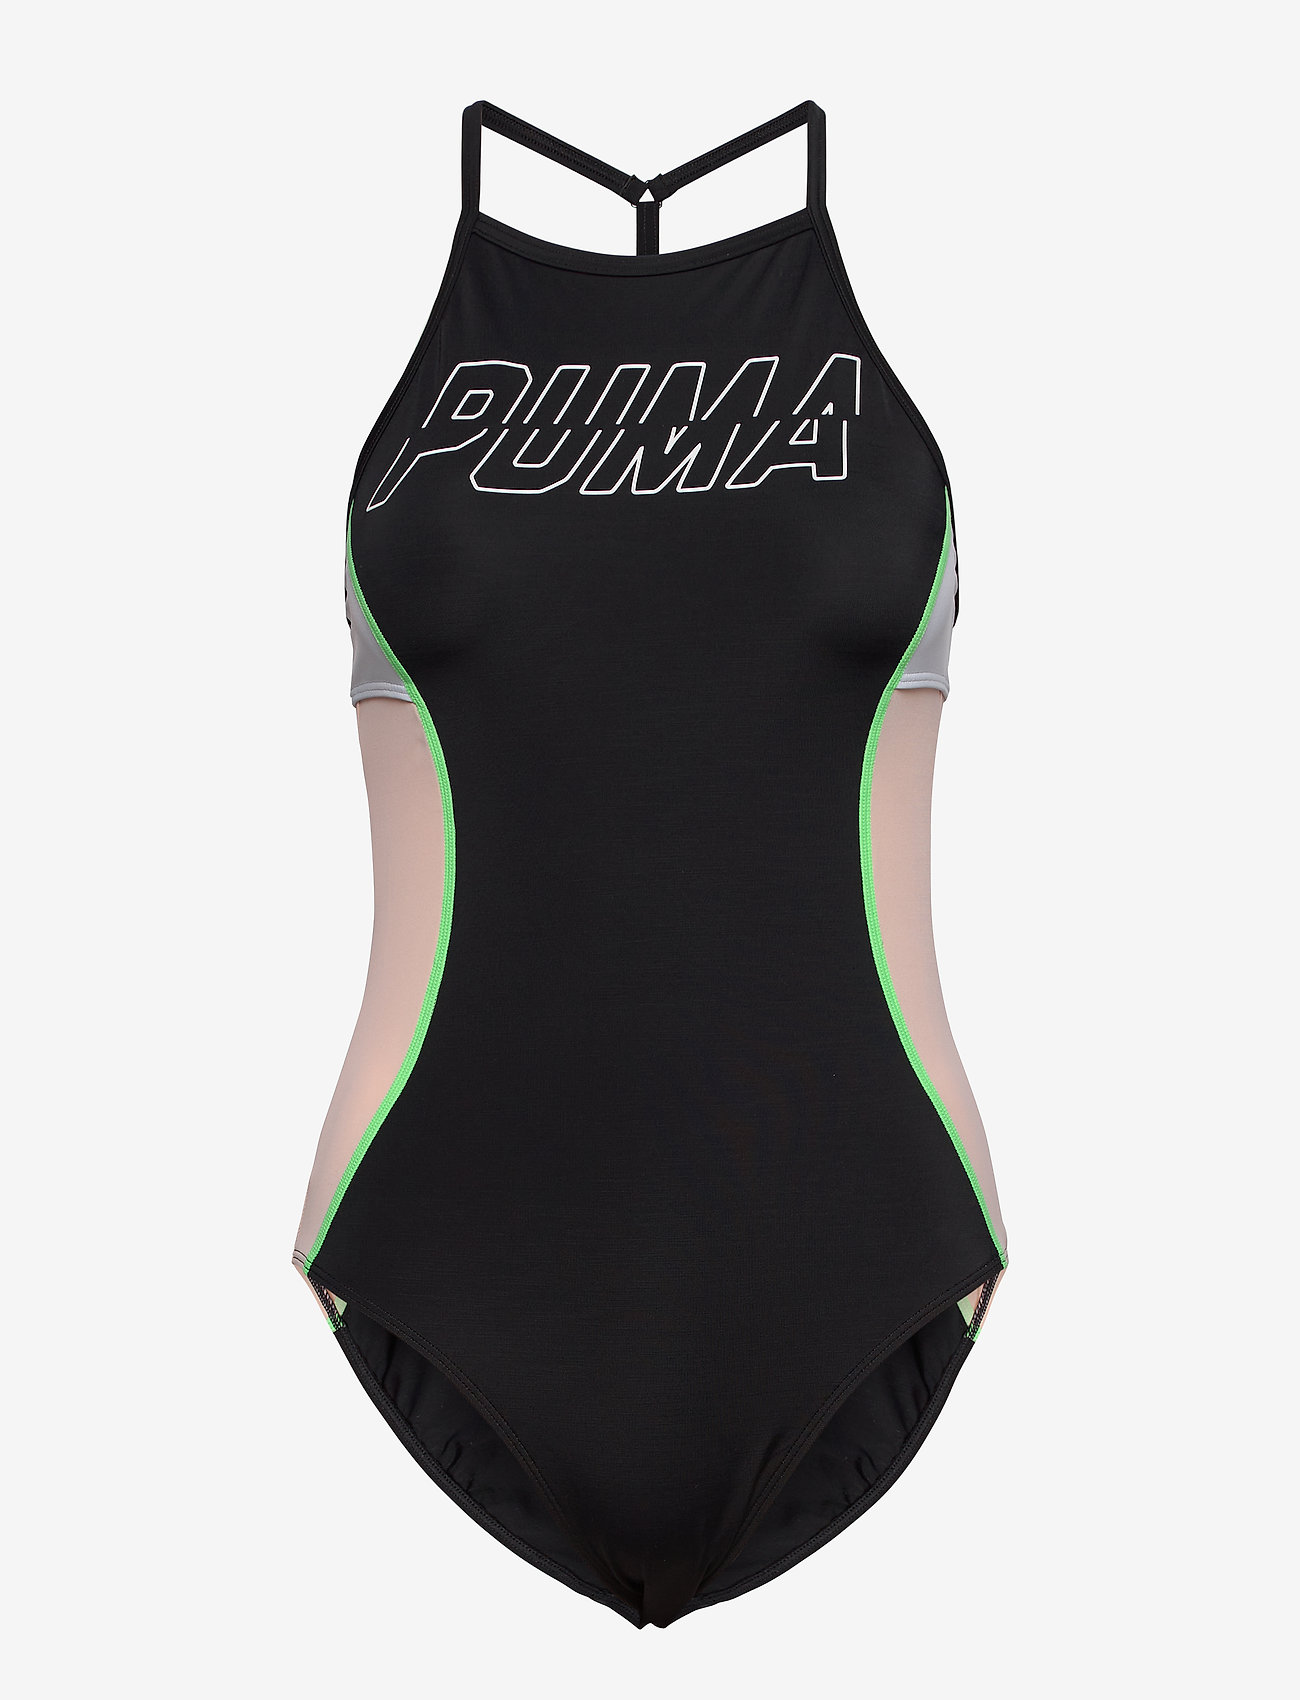 Puma Swim Puma Swim Women Racerback Swimsuit - Swimsuits   Boozt.com